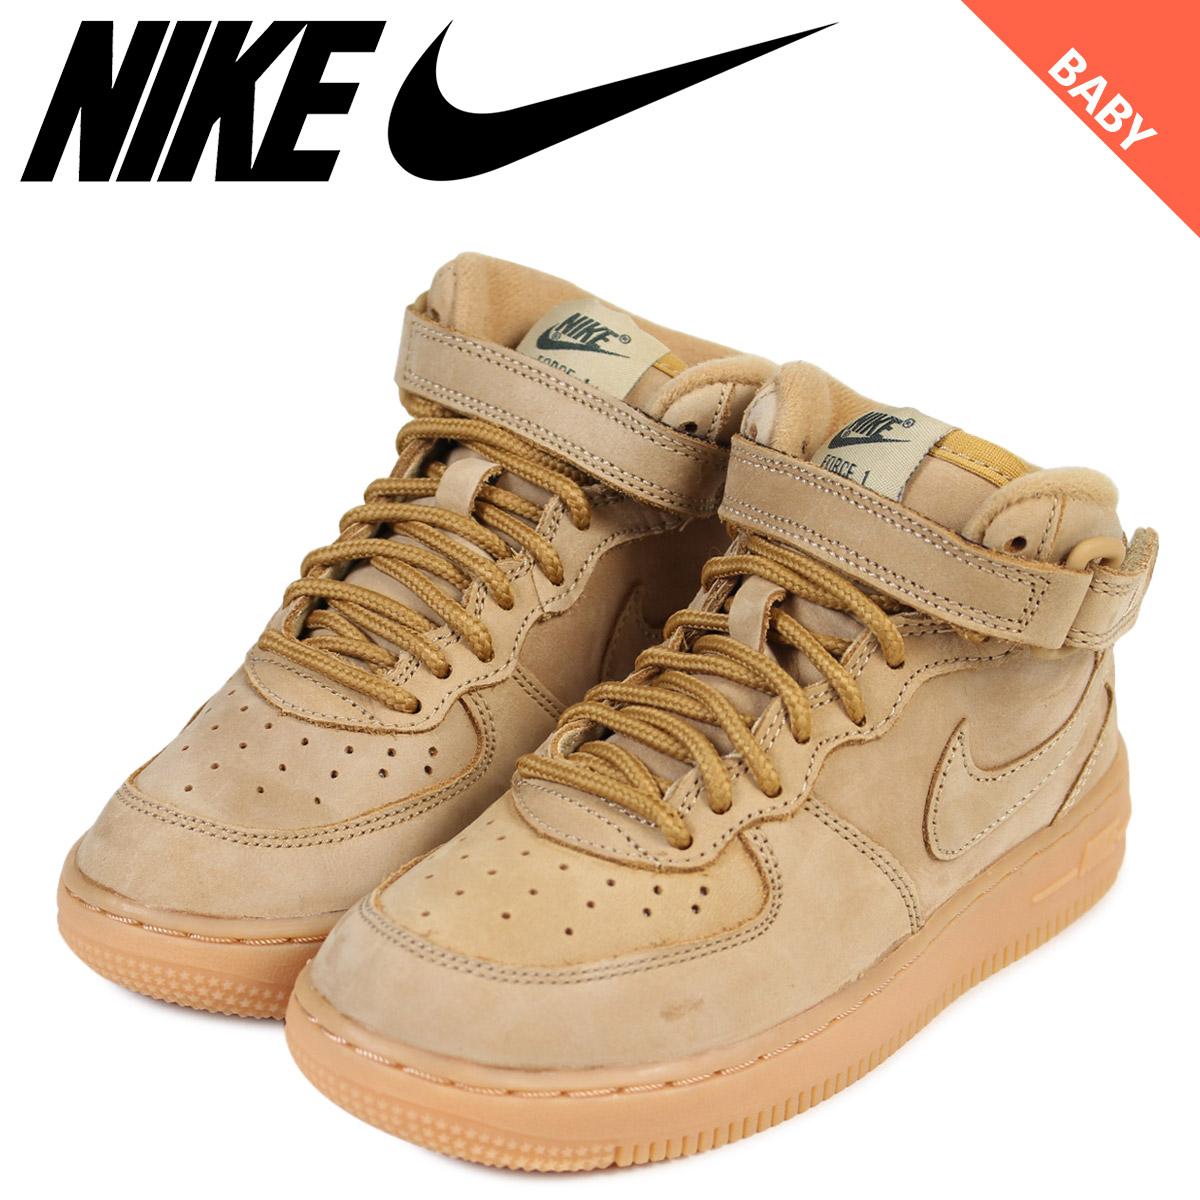 Baby Sneakers Nike Air Force Sugar 1 Online Shop Mid RqOcAT